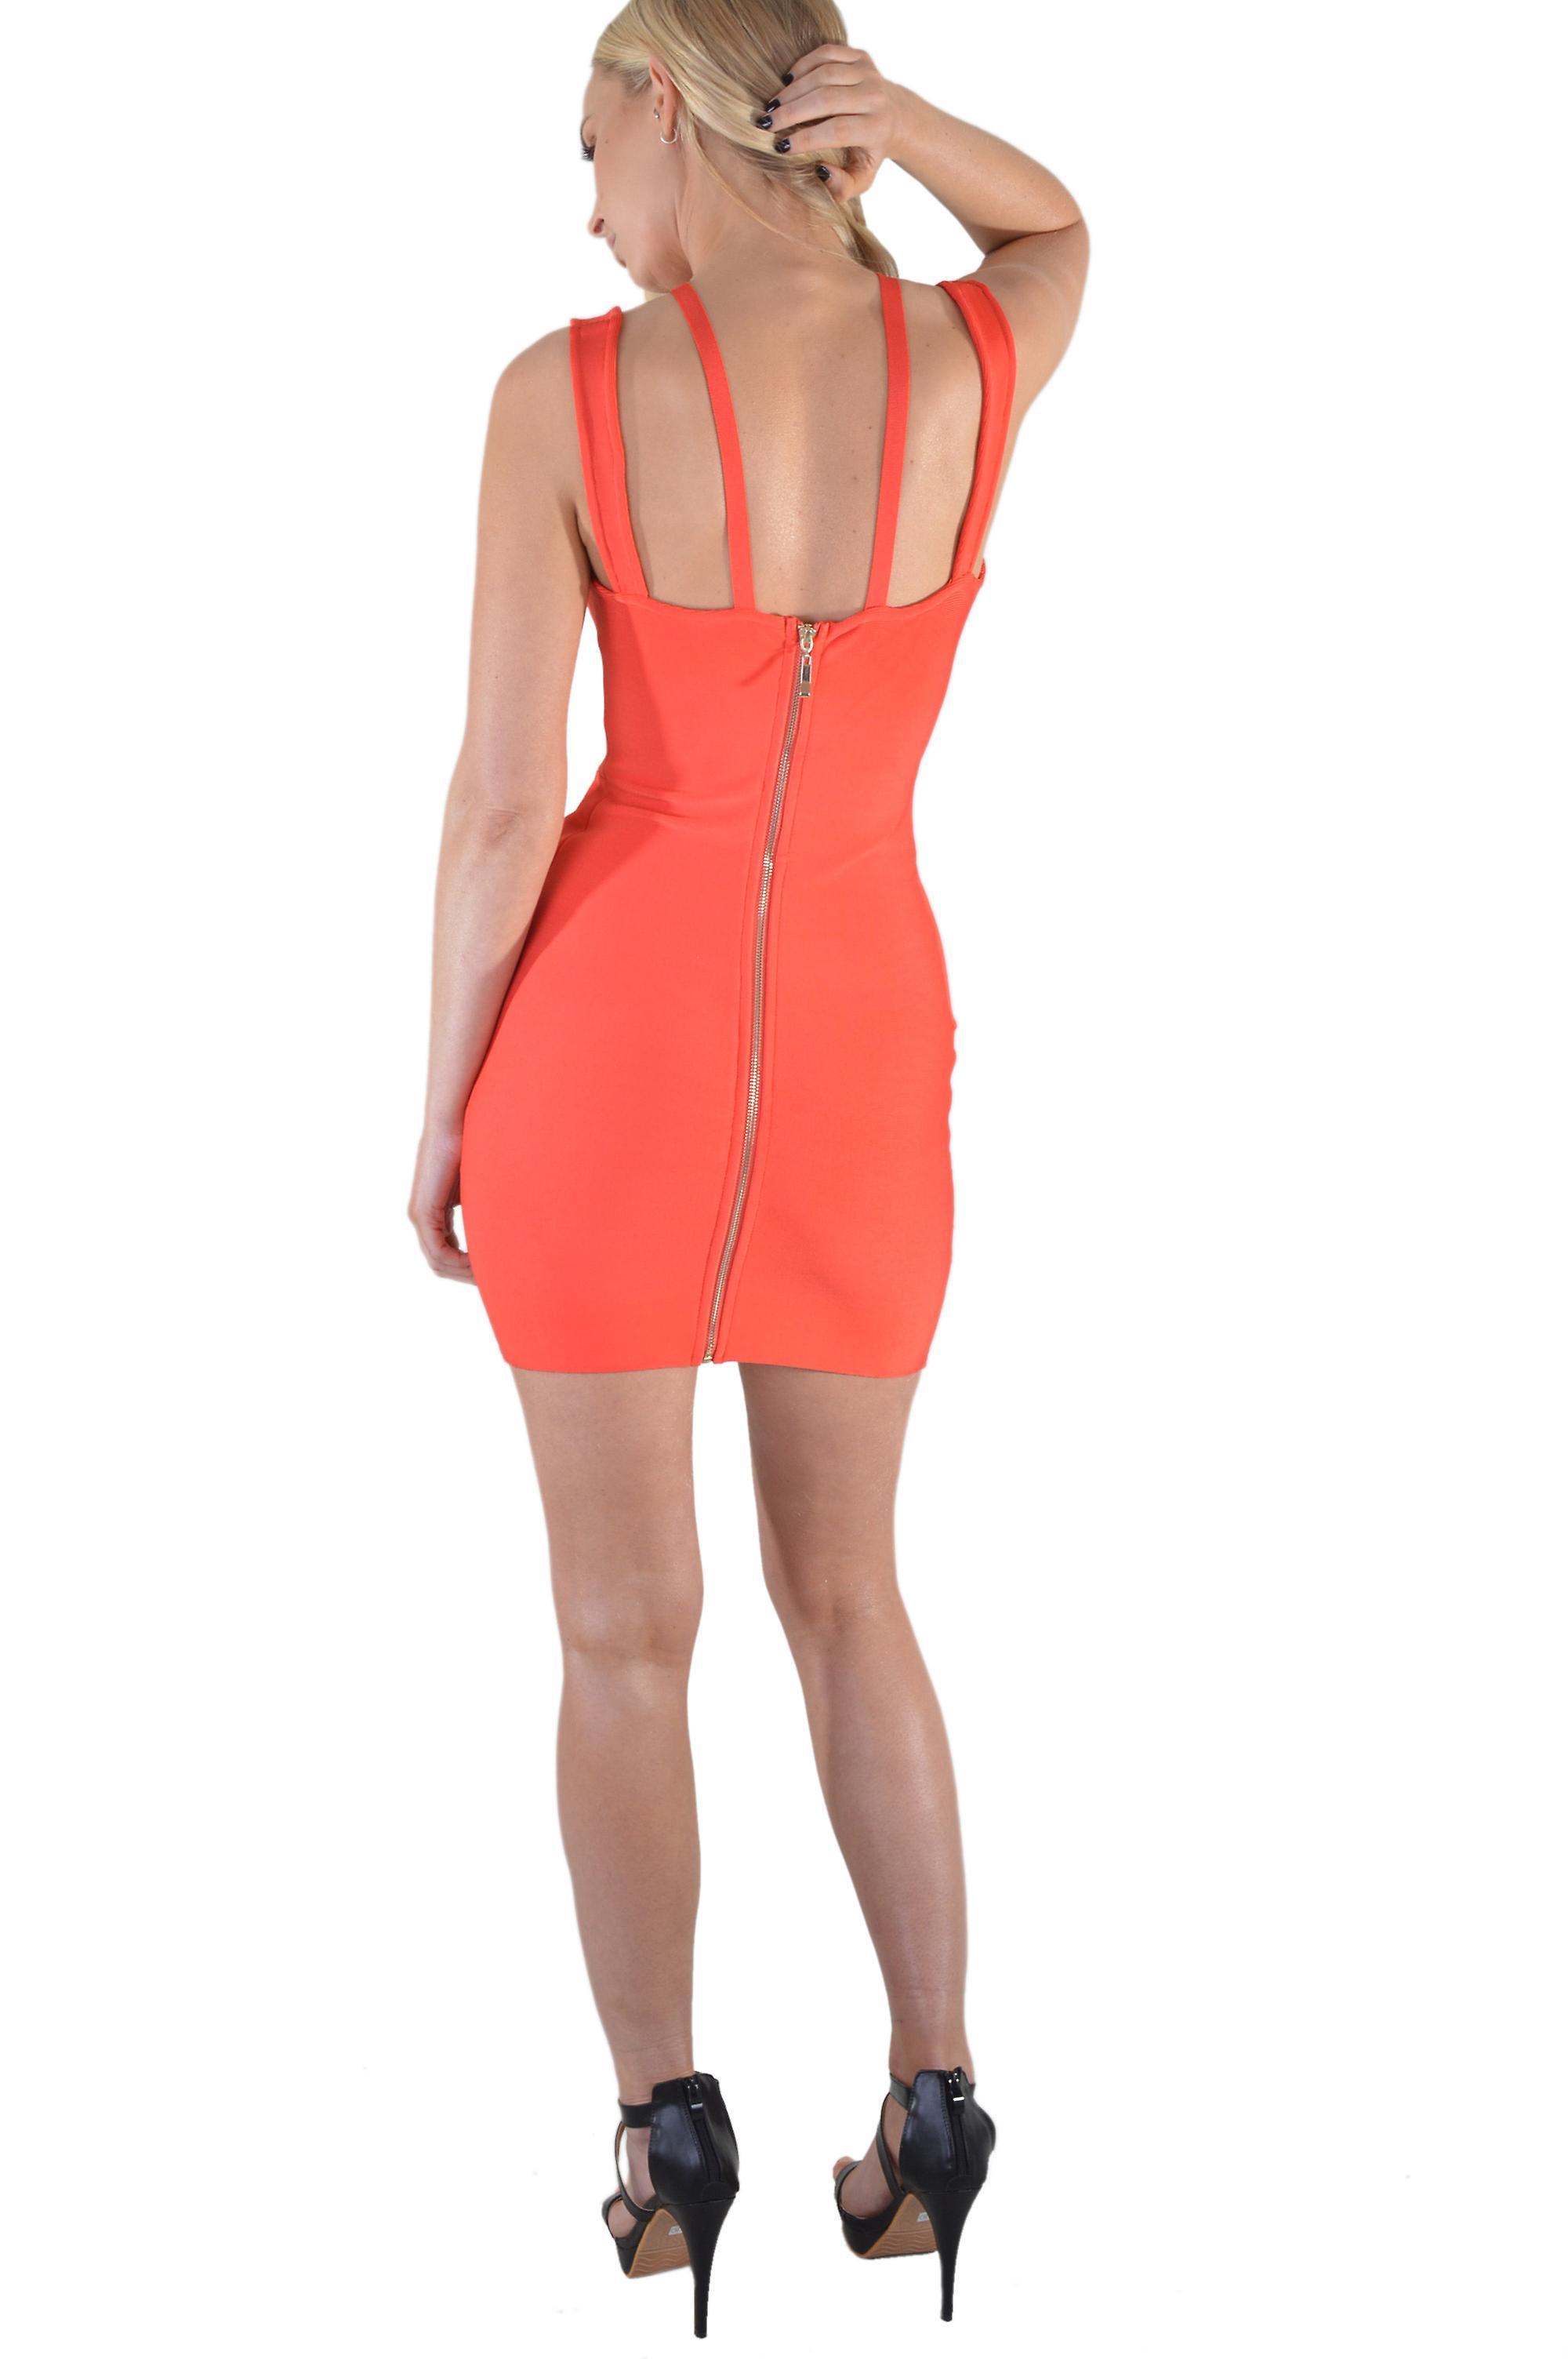 Lovemystyle Peplum Bandage Dress In Red